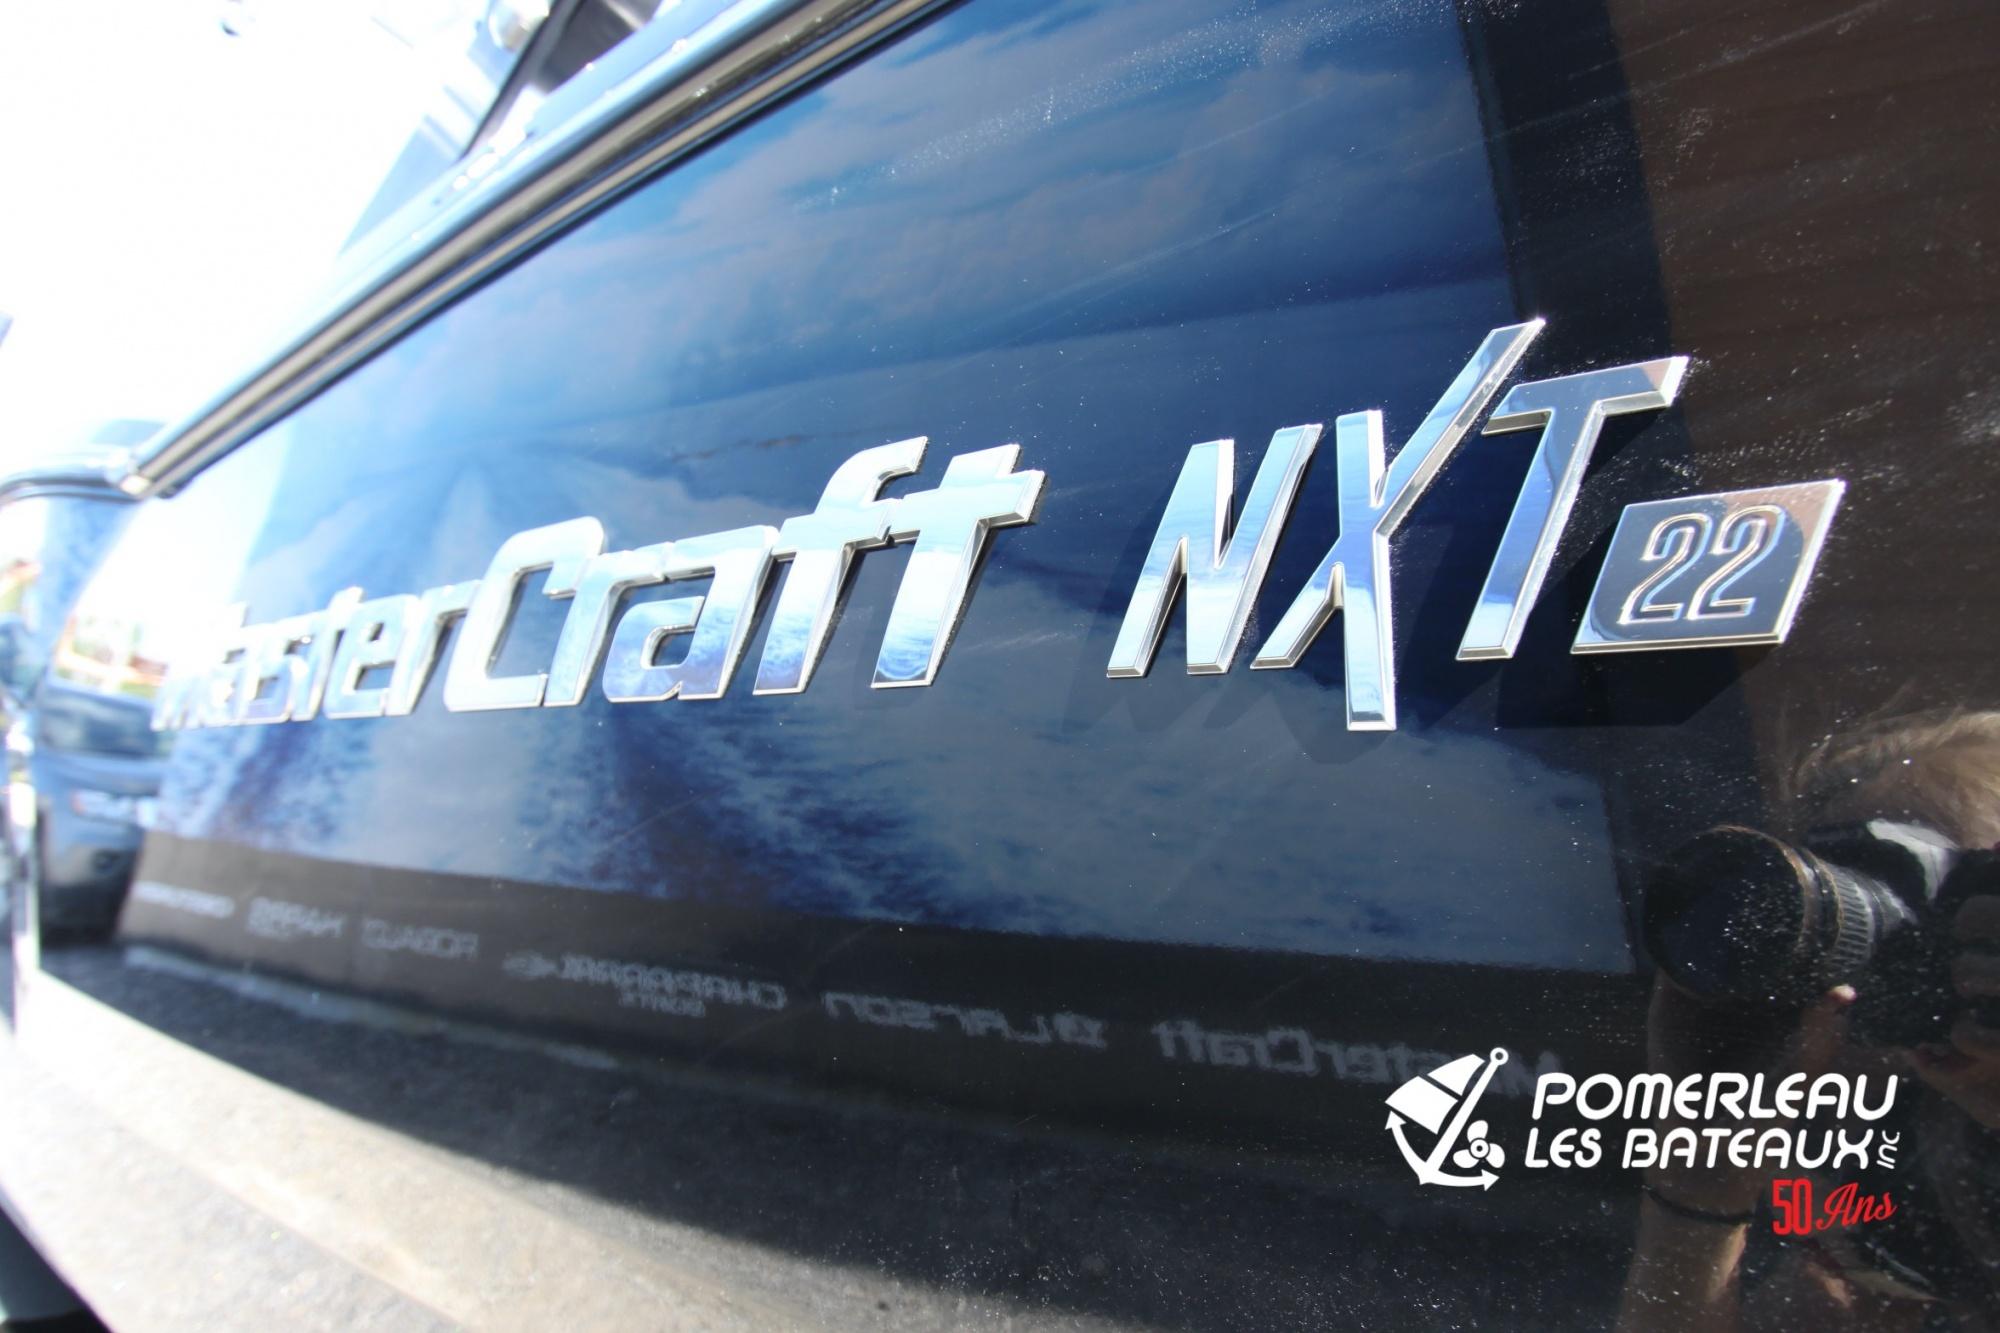 Mastercraft NXT 22 - IMG_8959